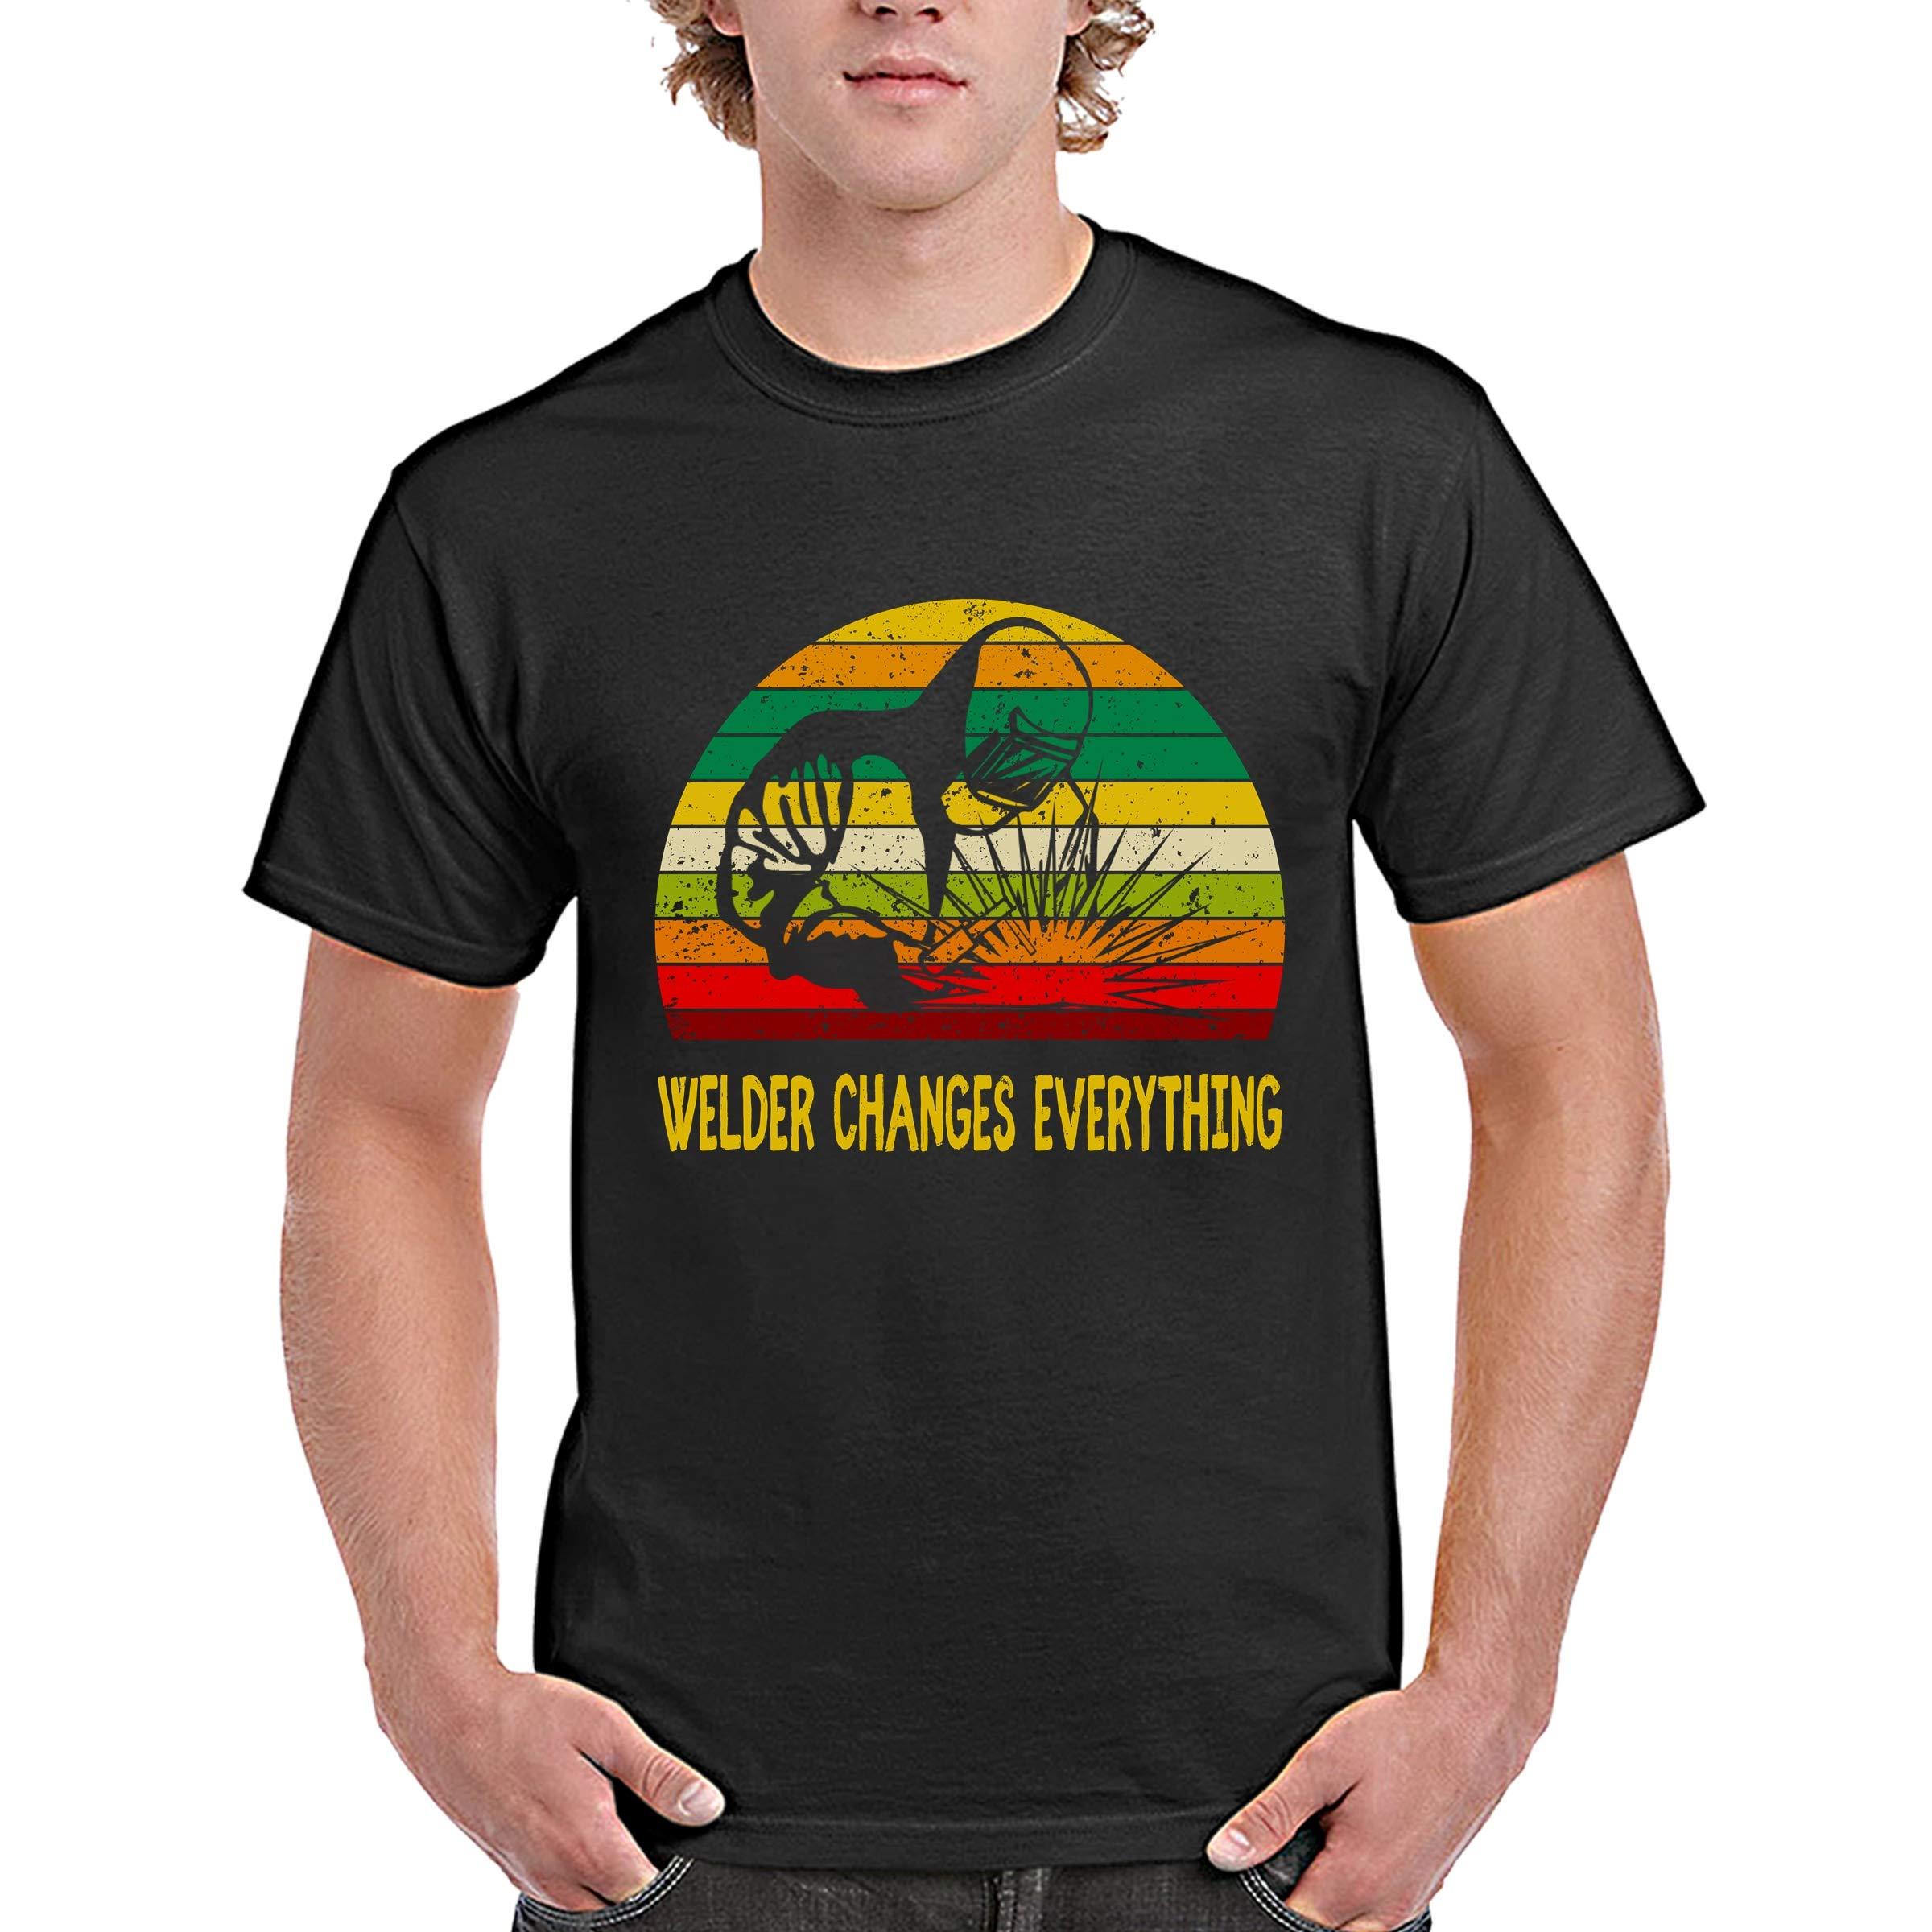 Funny Welder Vintage Retro Tshirt Welder Changes Everything For